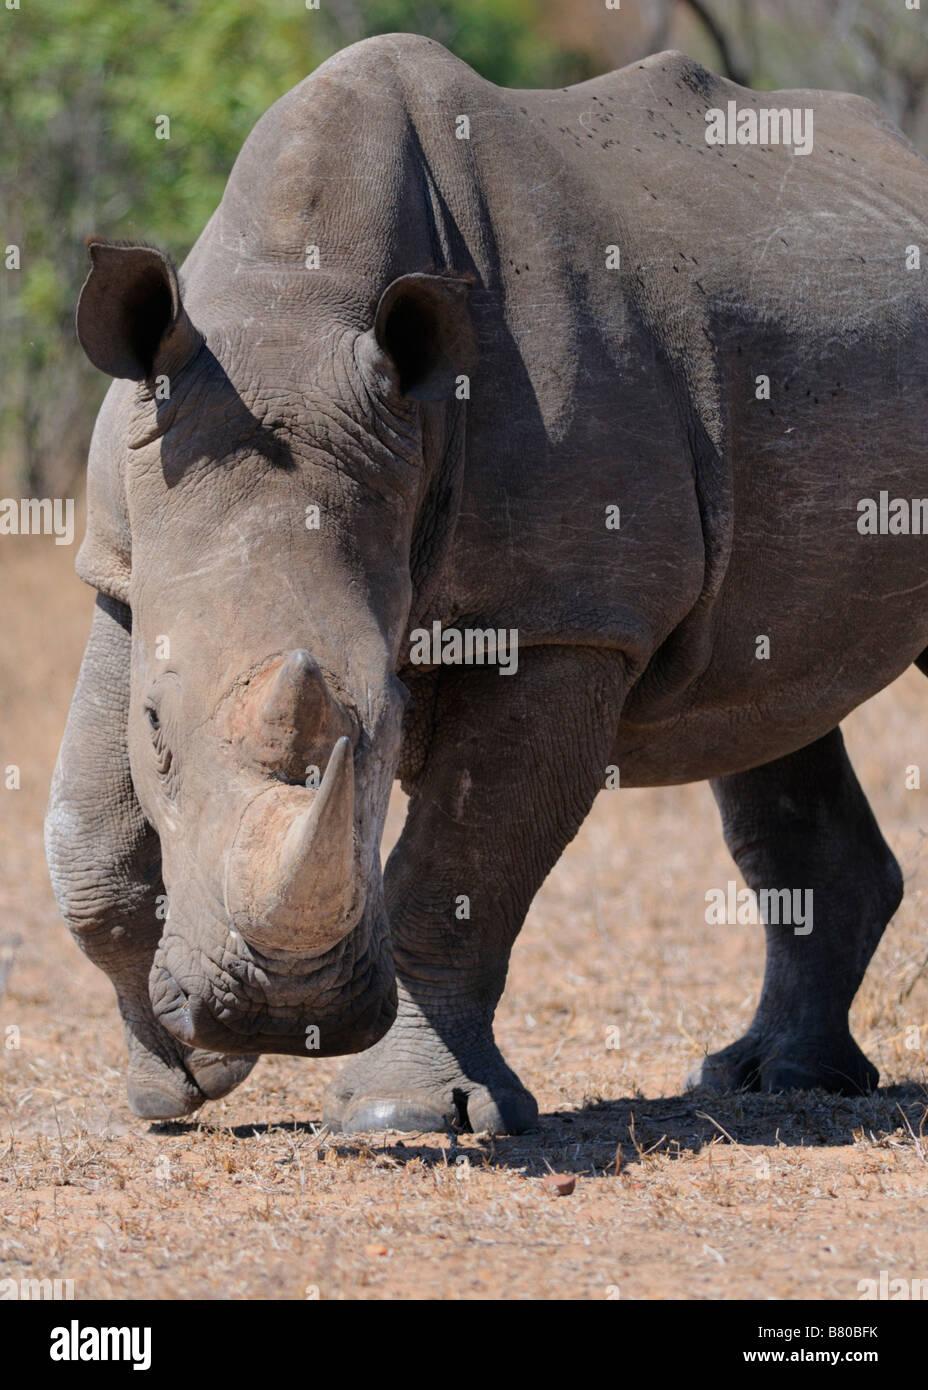 Rhino charge - Stock Image